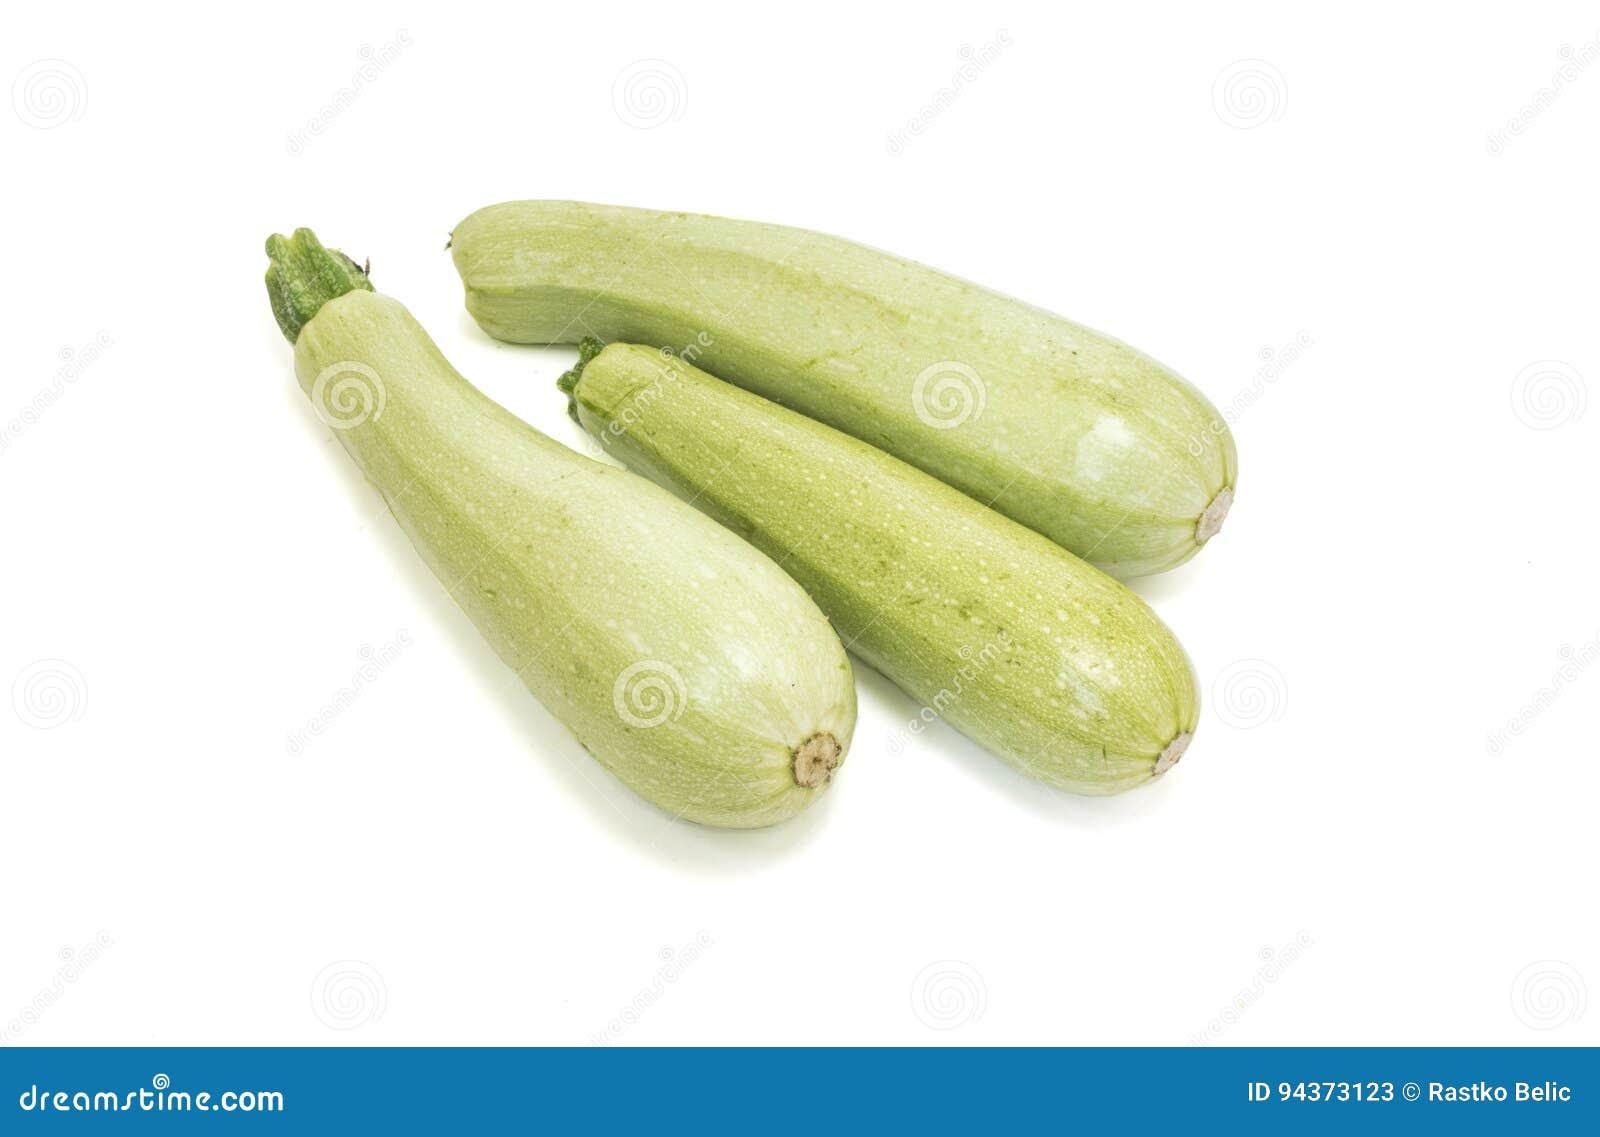 raw zucchini isolated on white